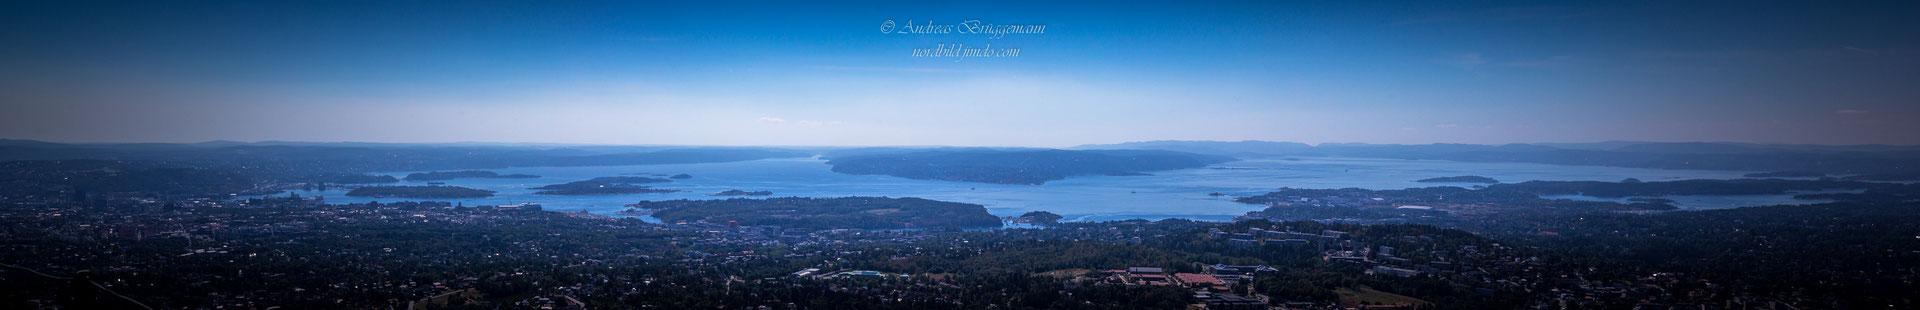 Blick über den Oslo-Fjord 2